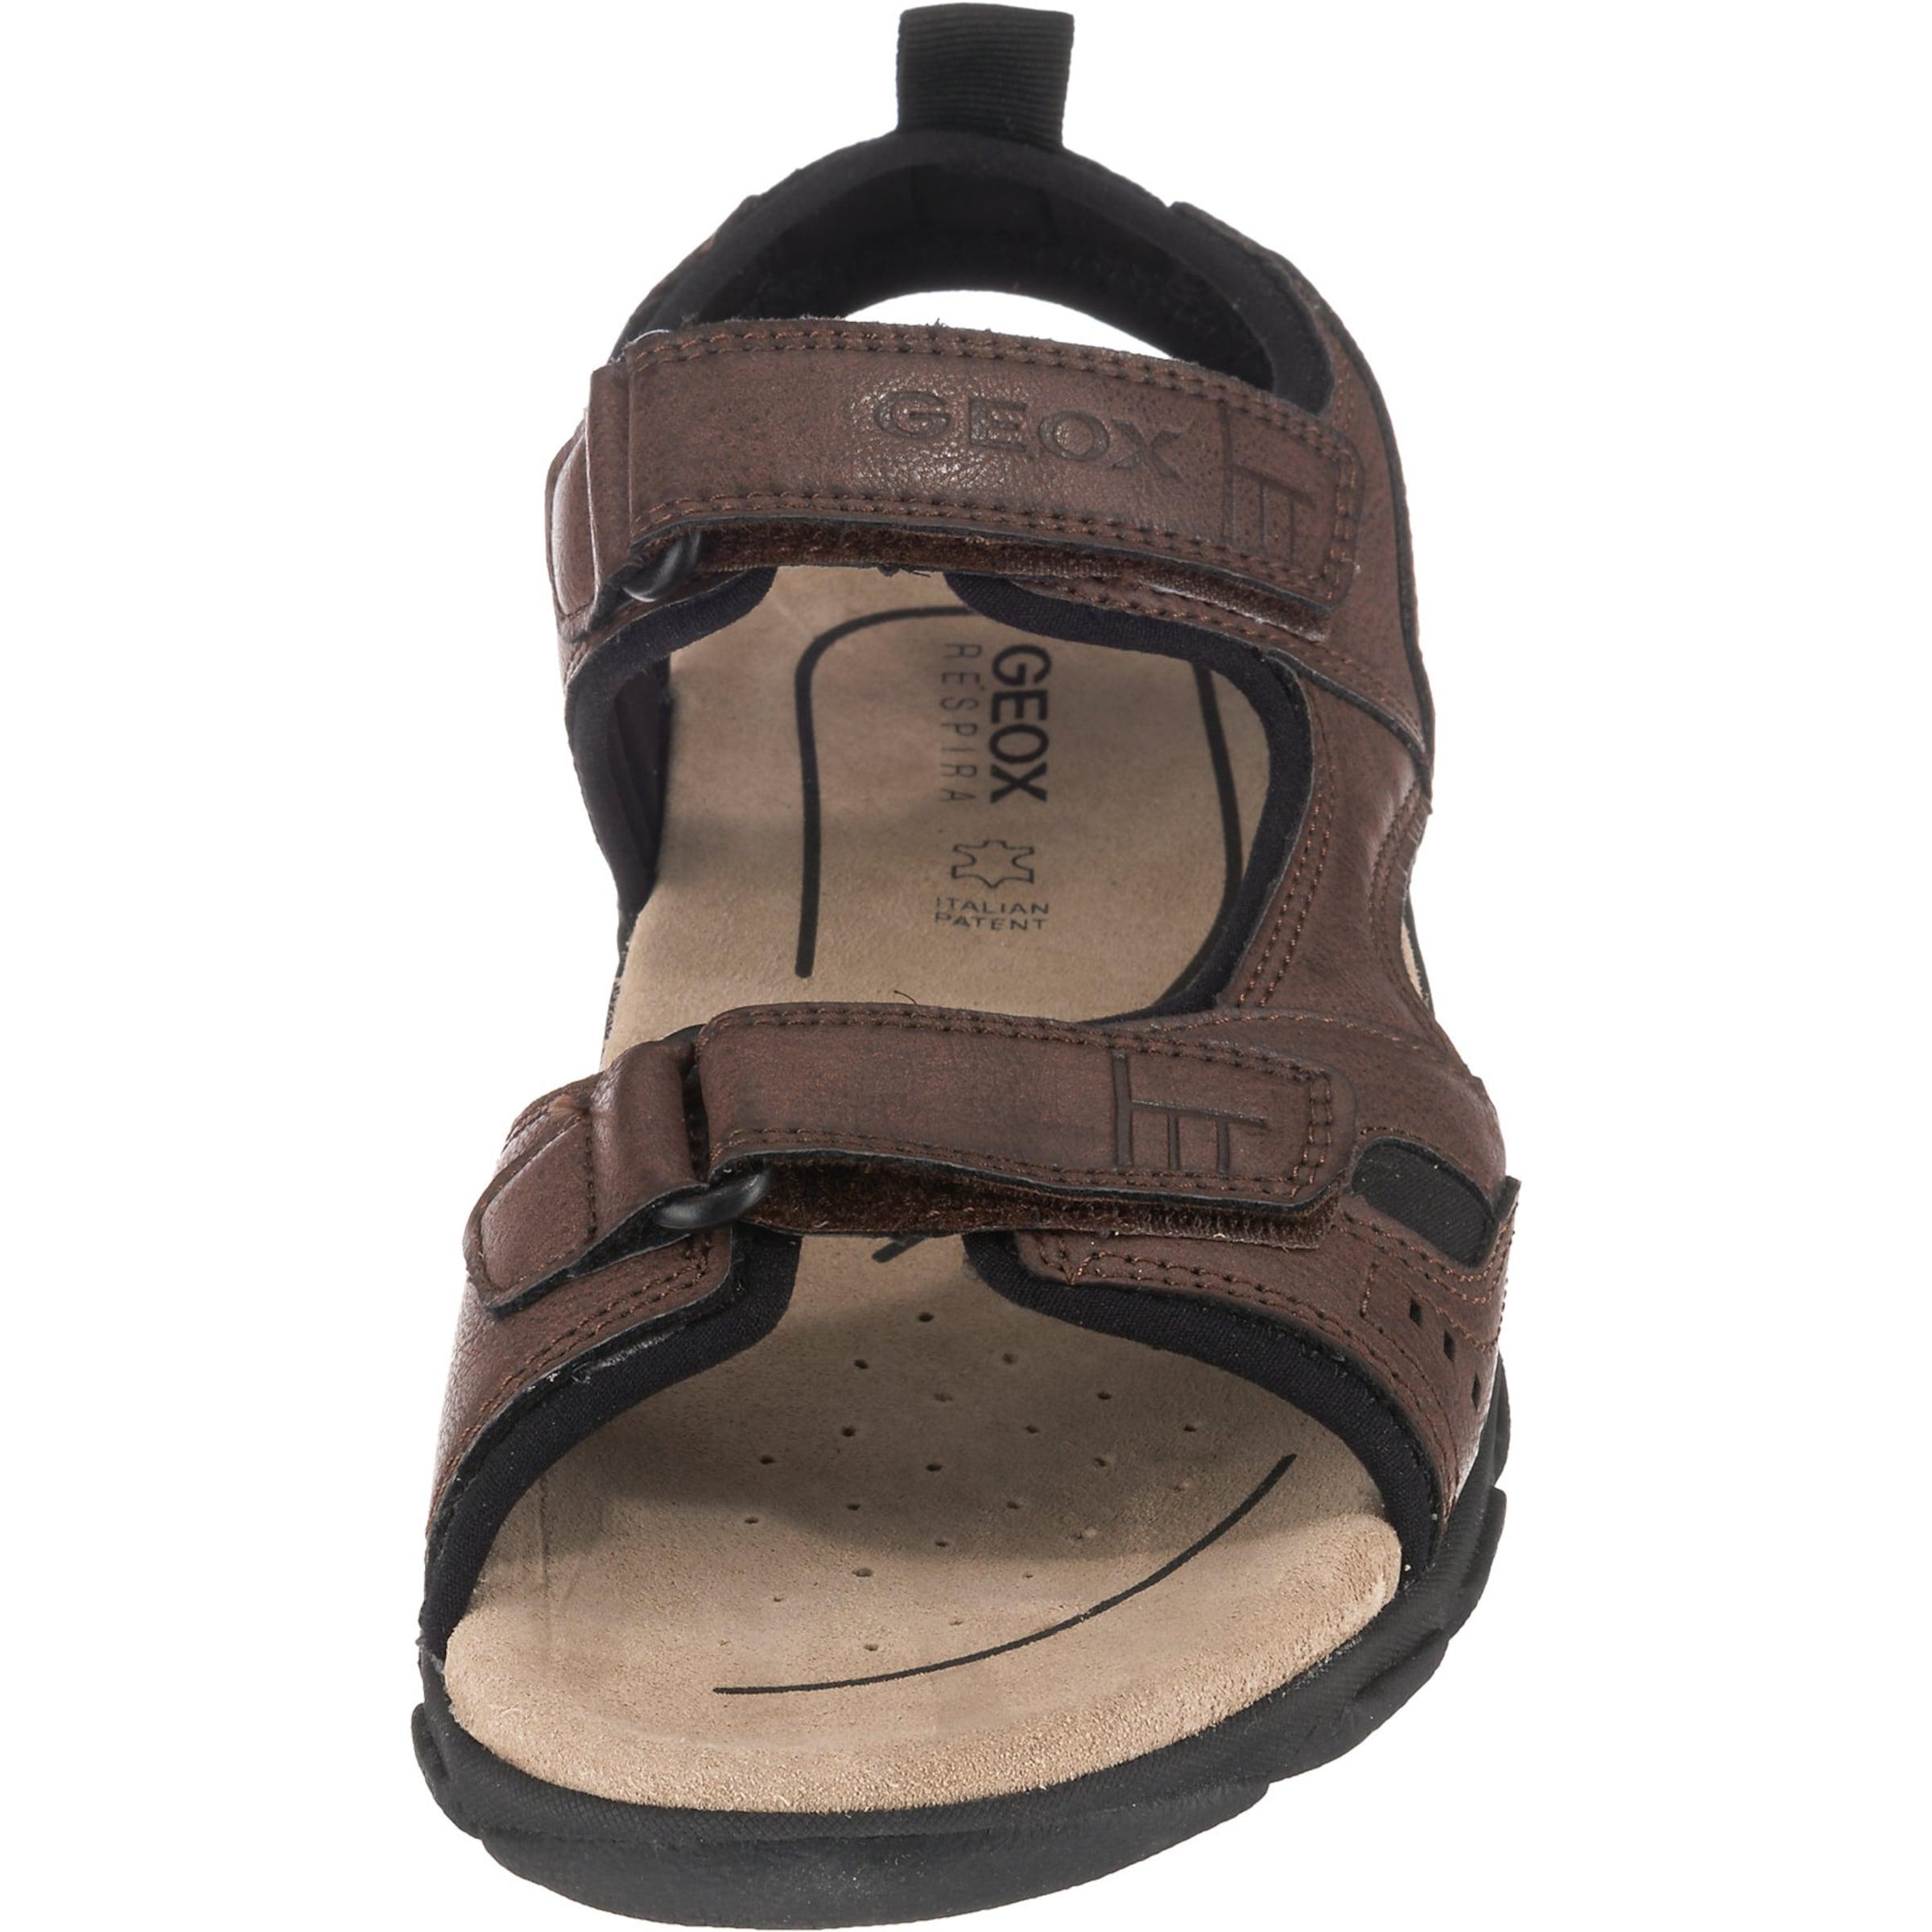 Geox Komfort Geox BraunSchwarz In sandale QCWrdeoxB